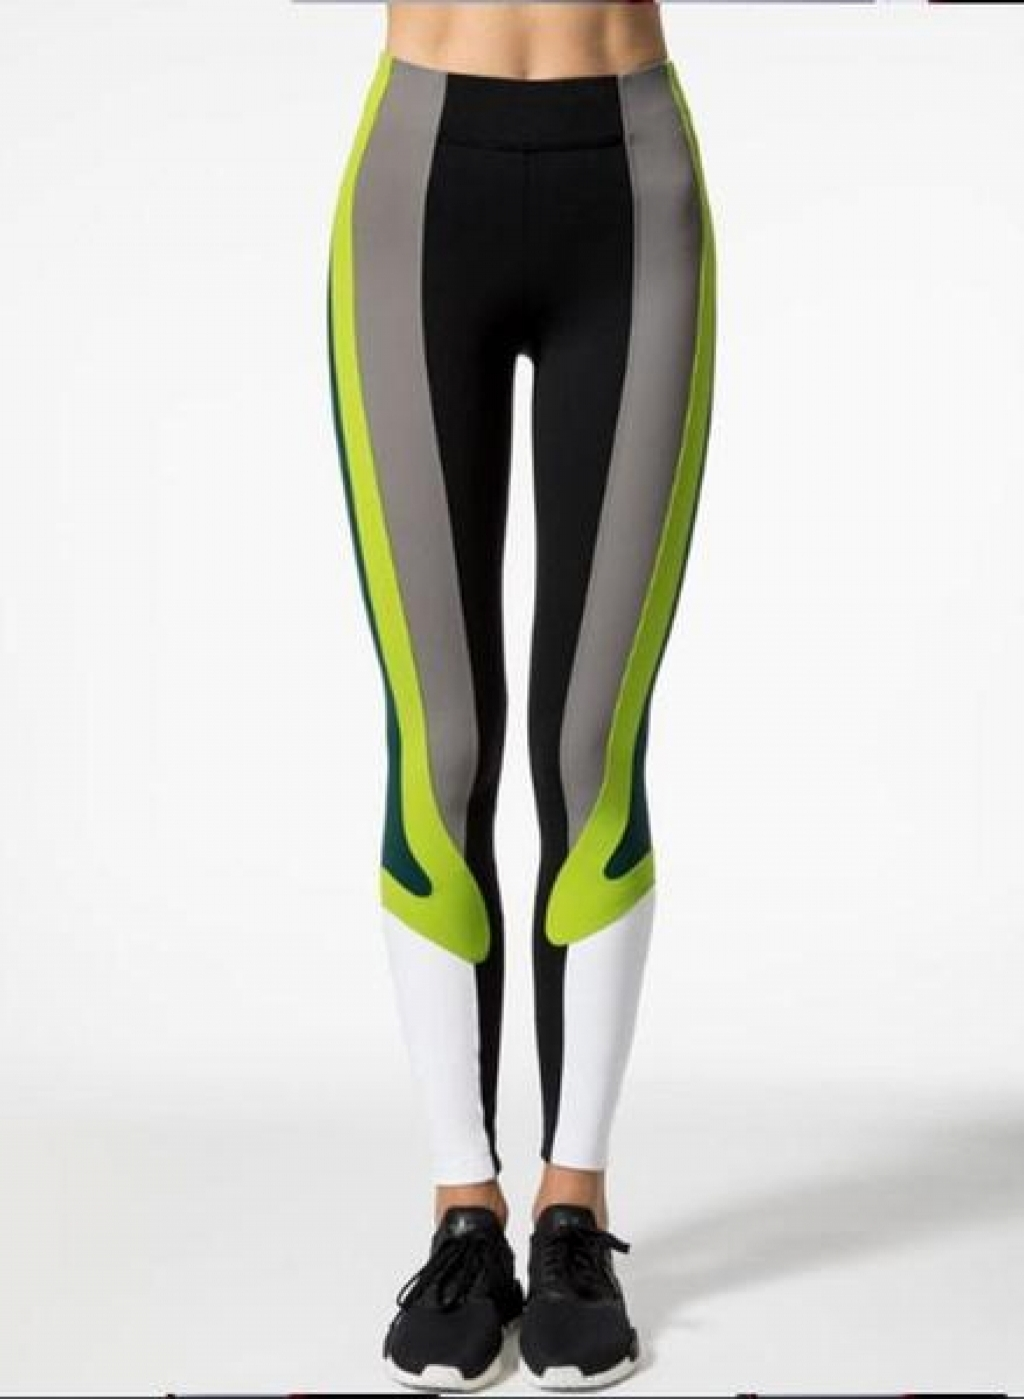 15429842900_liz-m-leggings-kihii-legging-1423131181096_grande.jpg